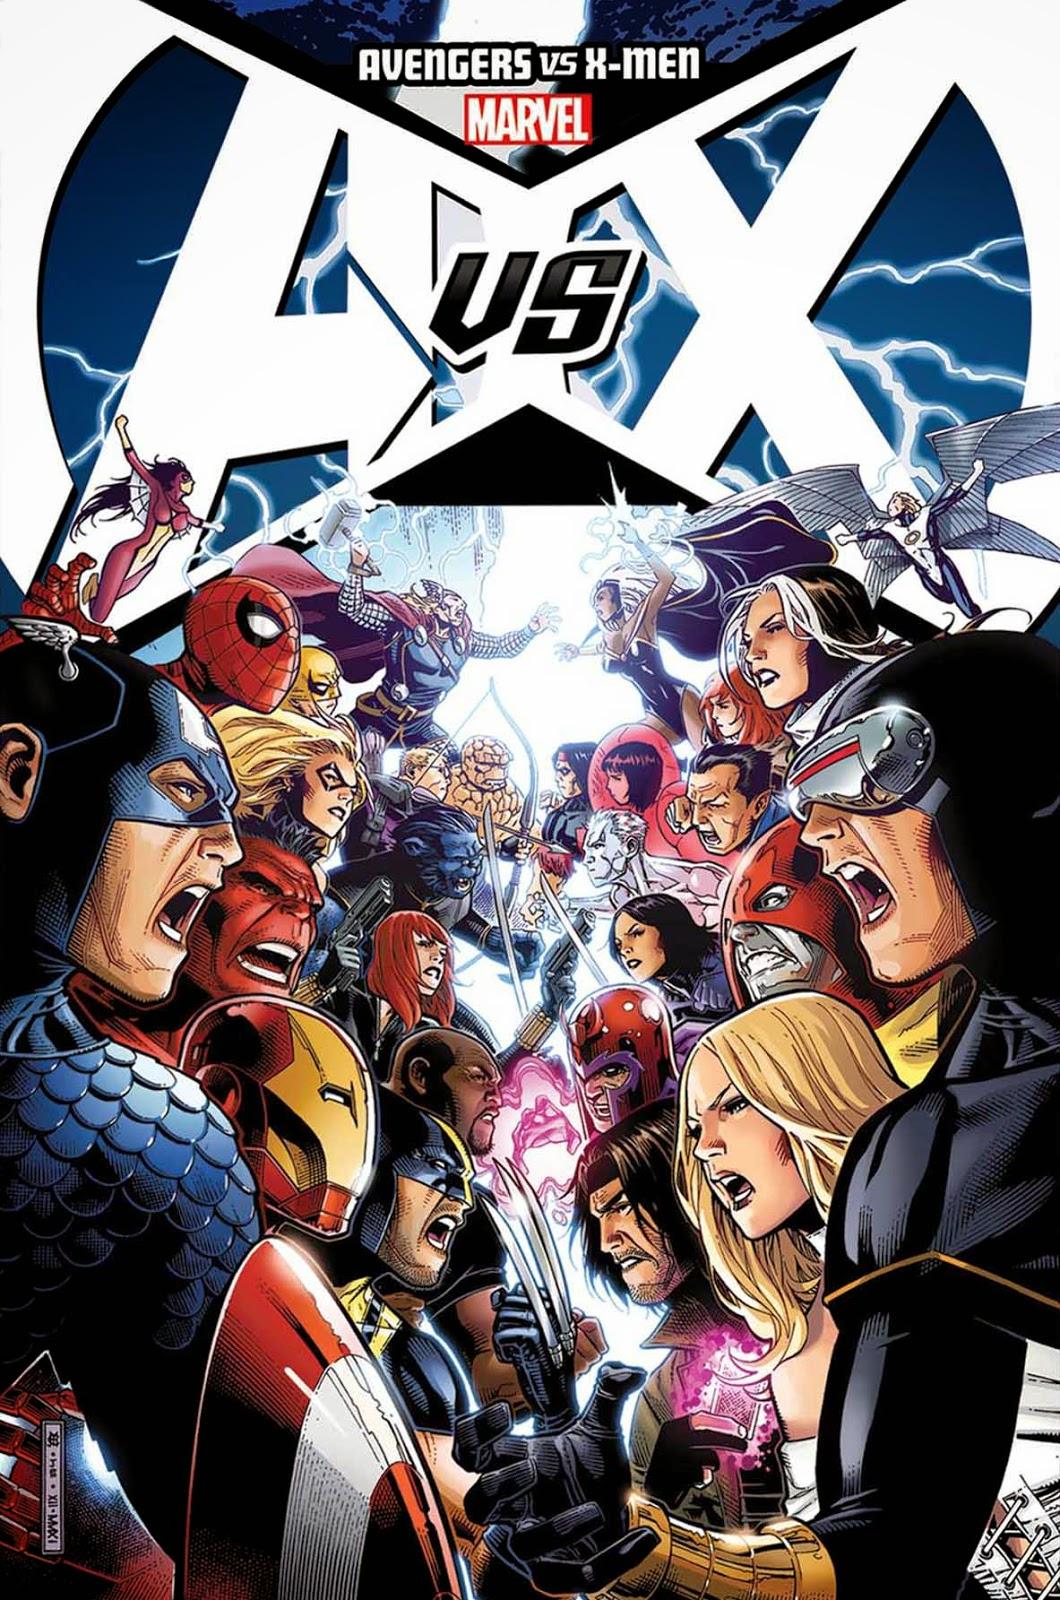 Avengers Vs. X-Men | Comics | Comics Dune